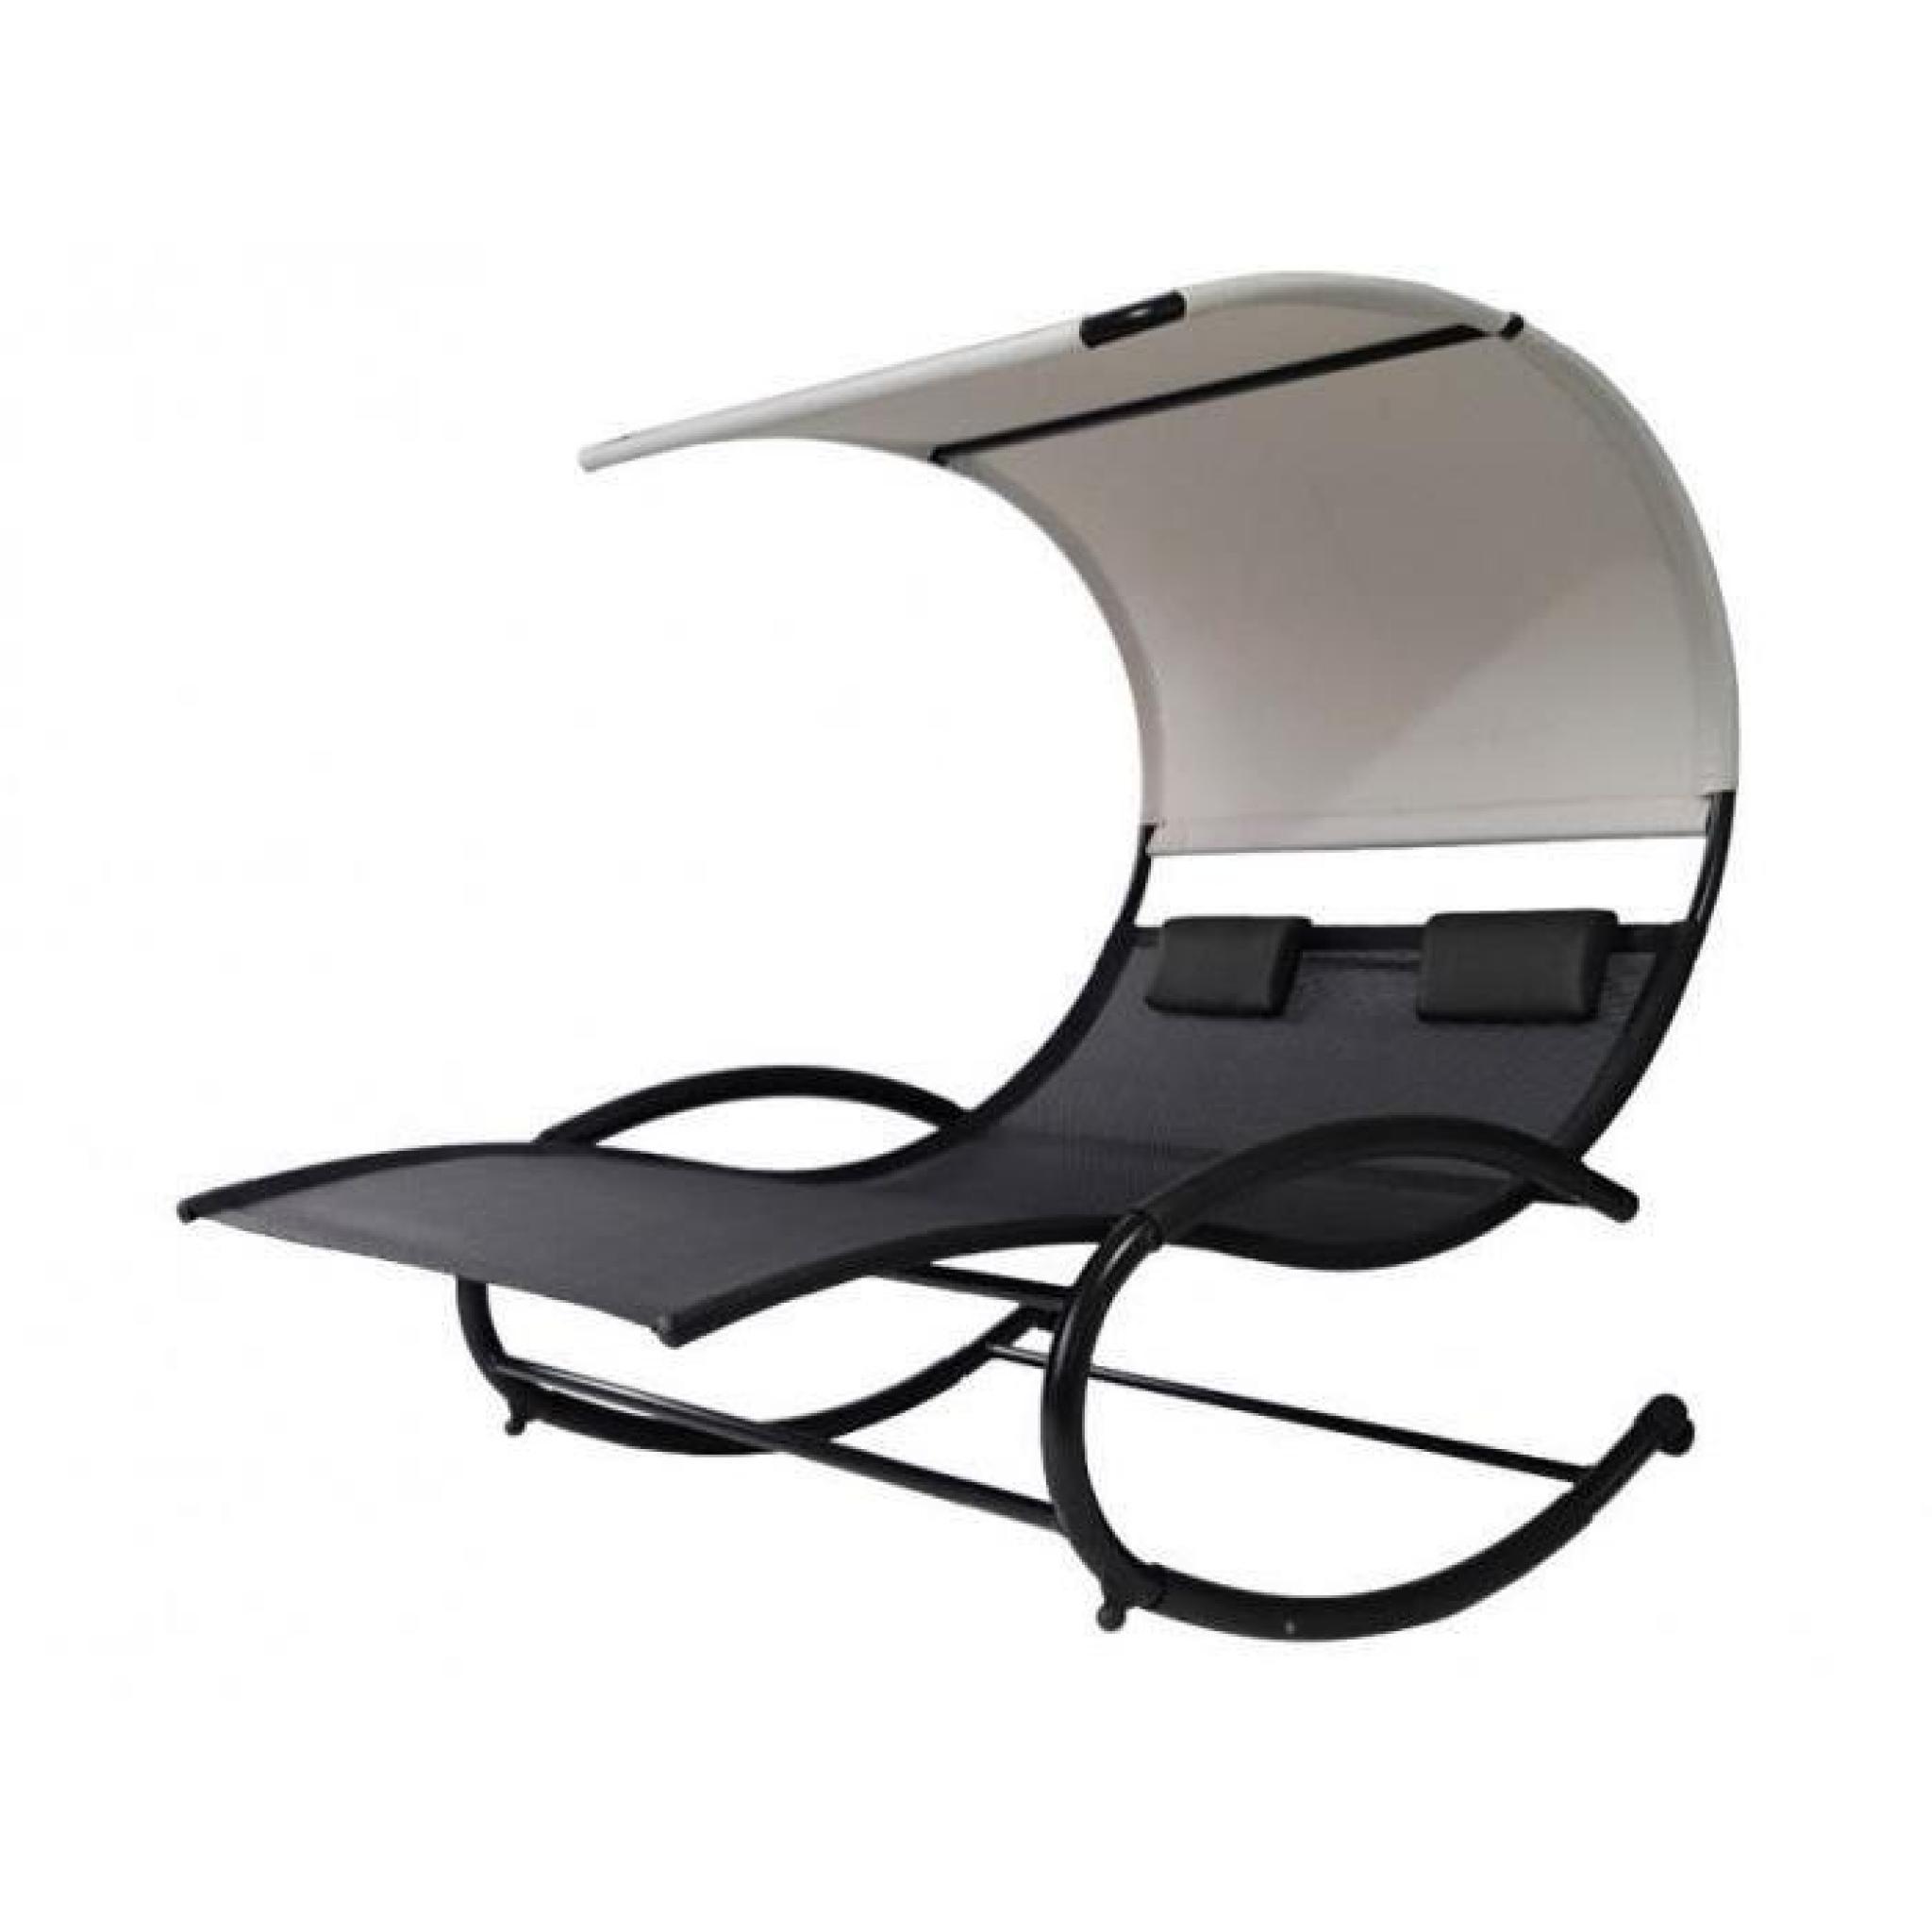 bain de soleil sumba en aluminium et textil ne gris. Black Bedroom Furniture Sets. Home Design Ideas